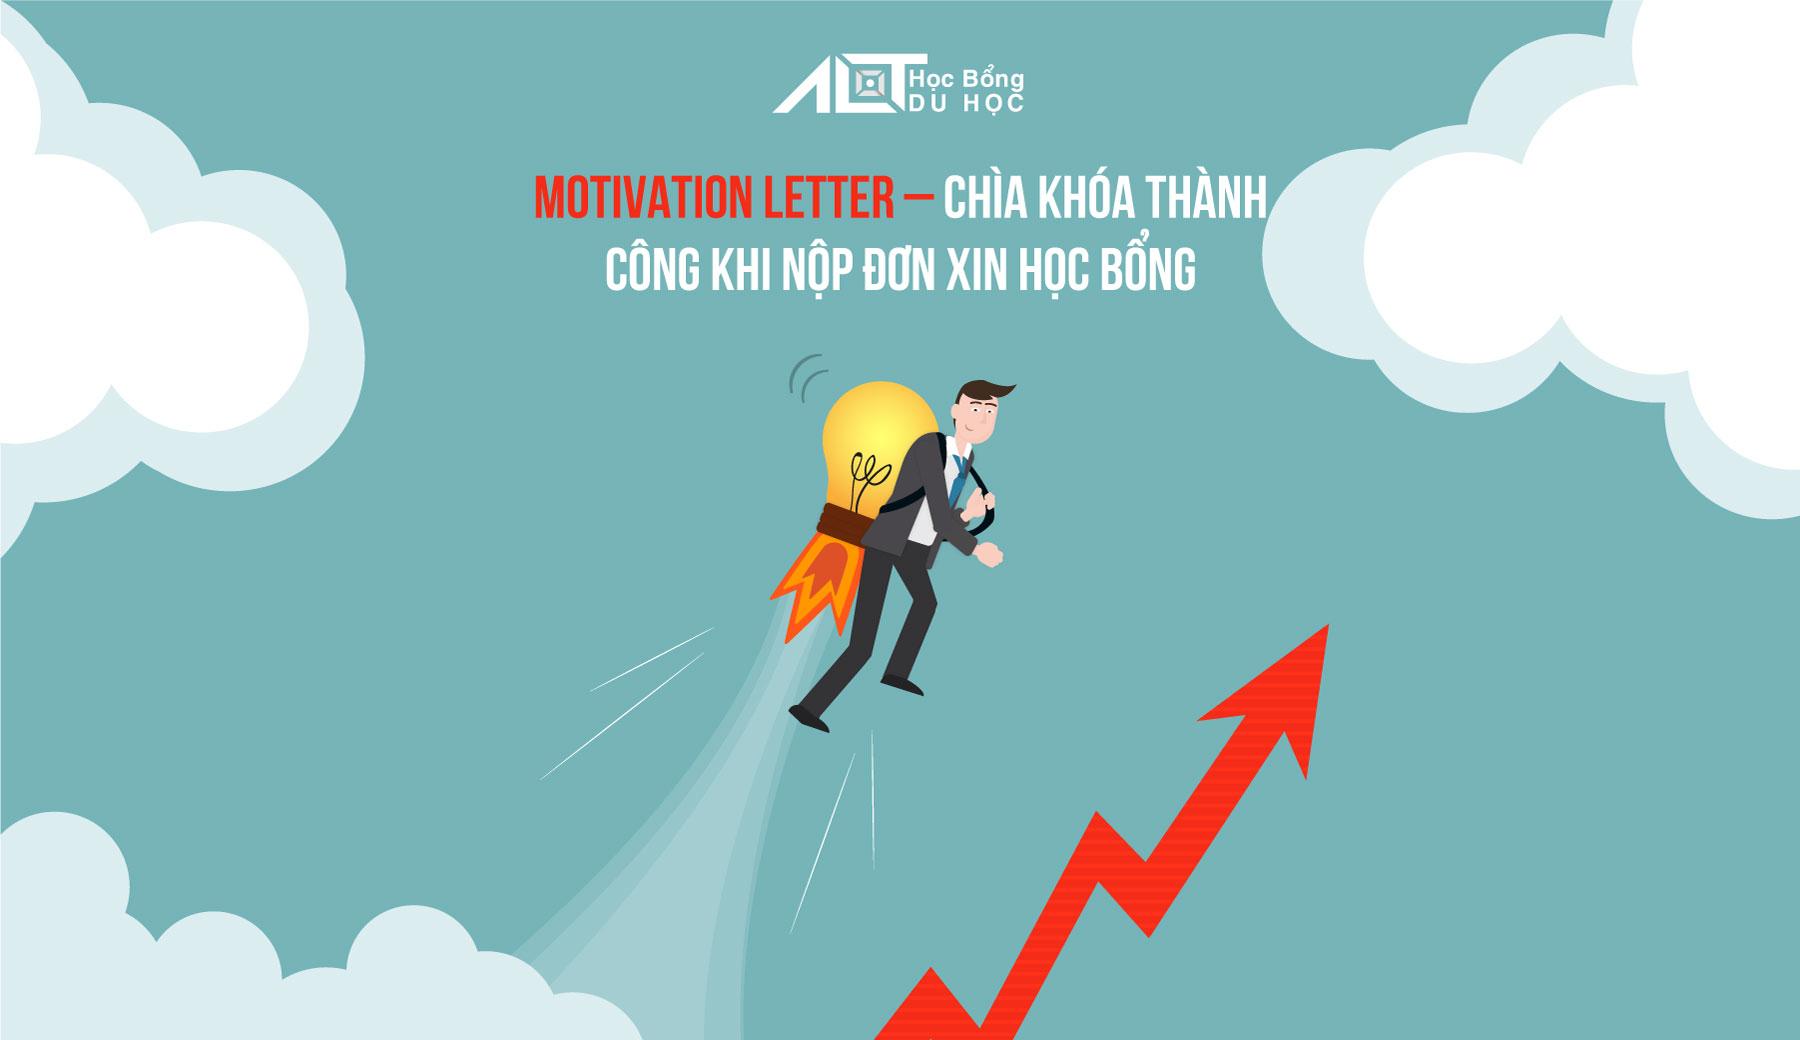 Motivation letter là gì - Cách viết motivation letter đúng chuẩn